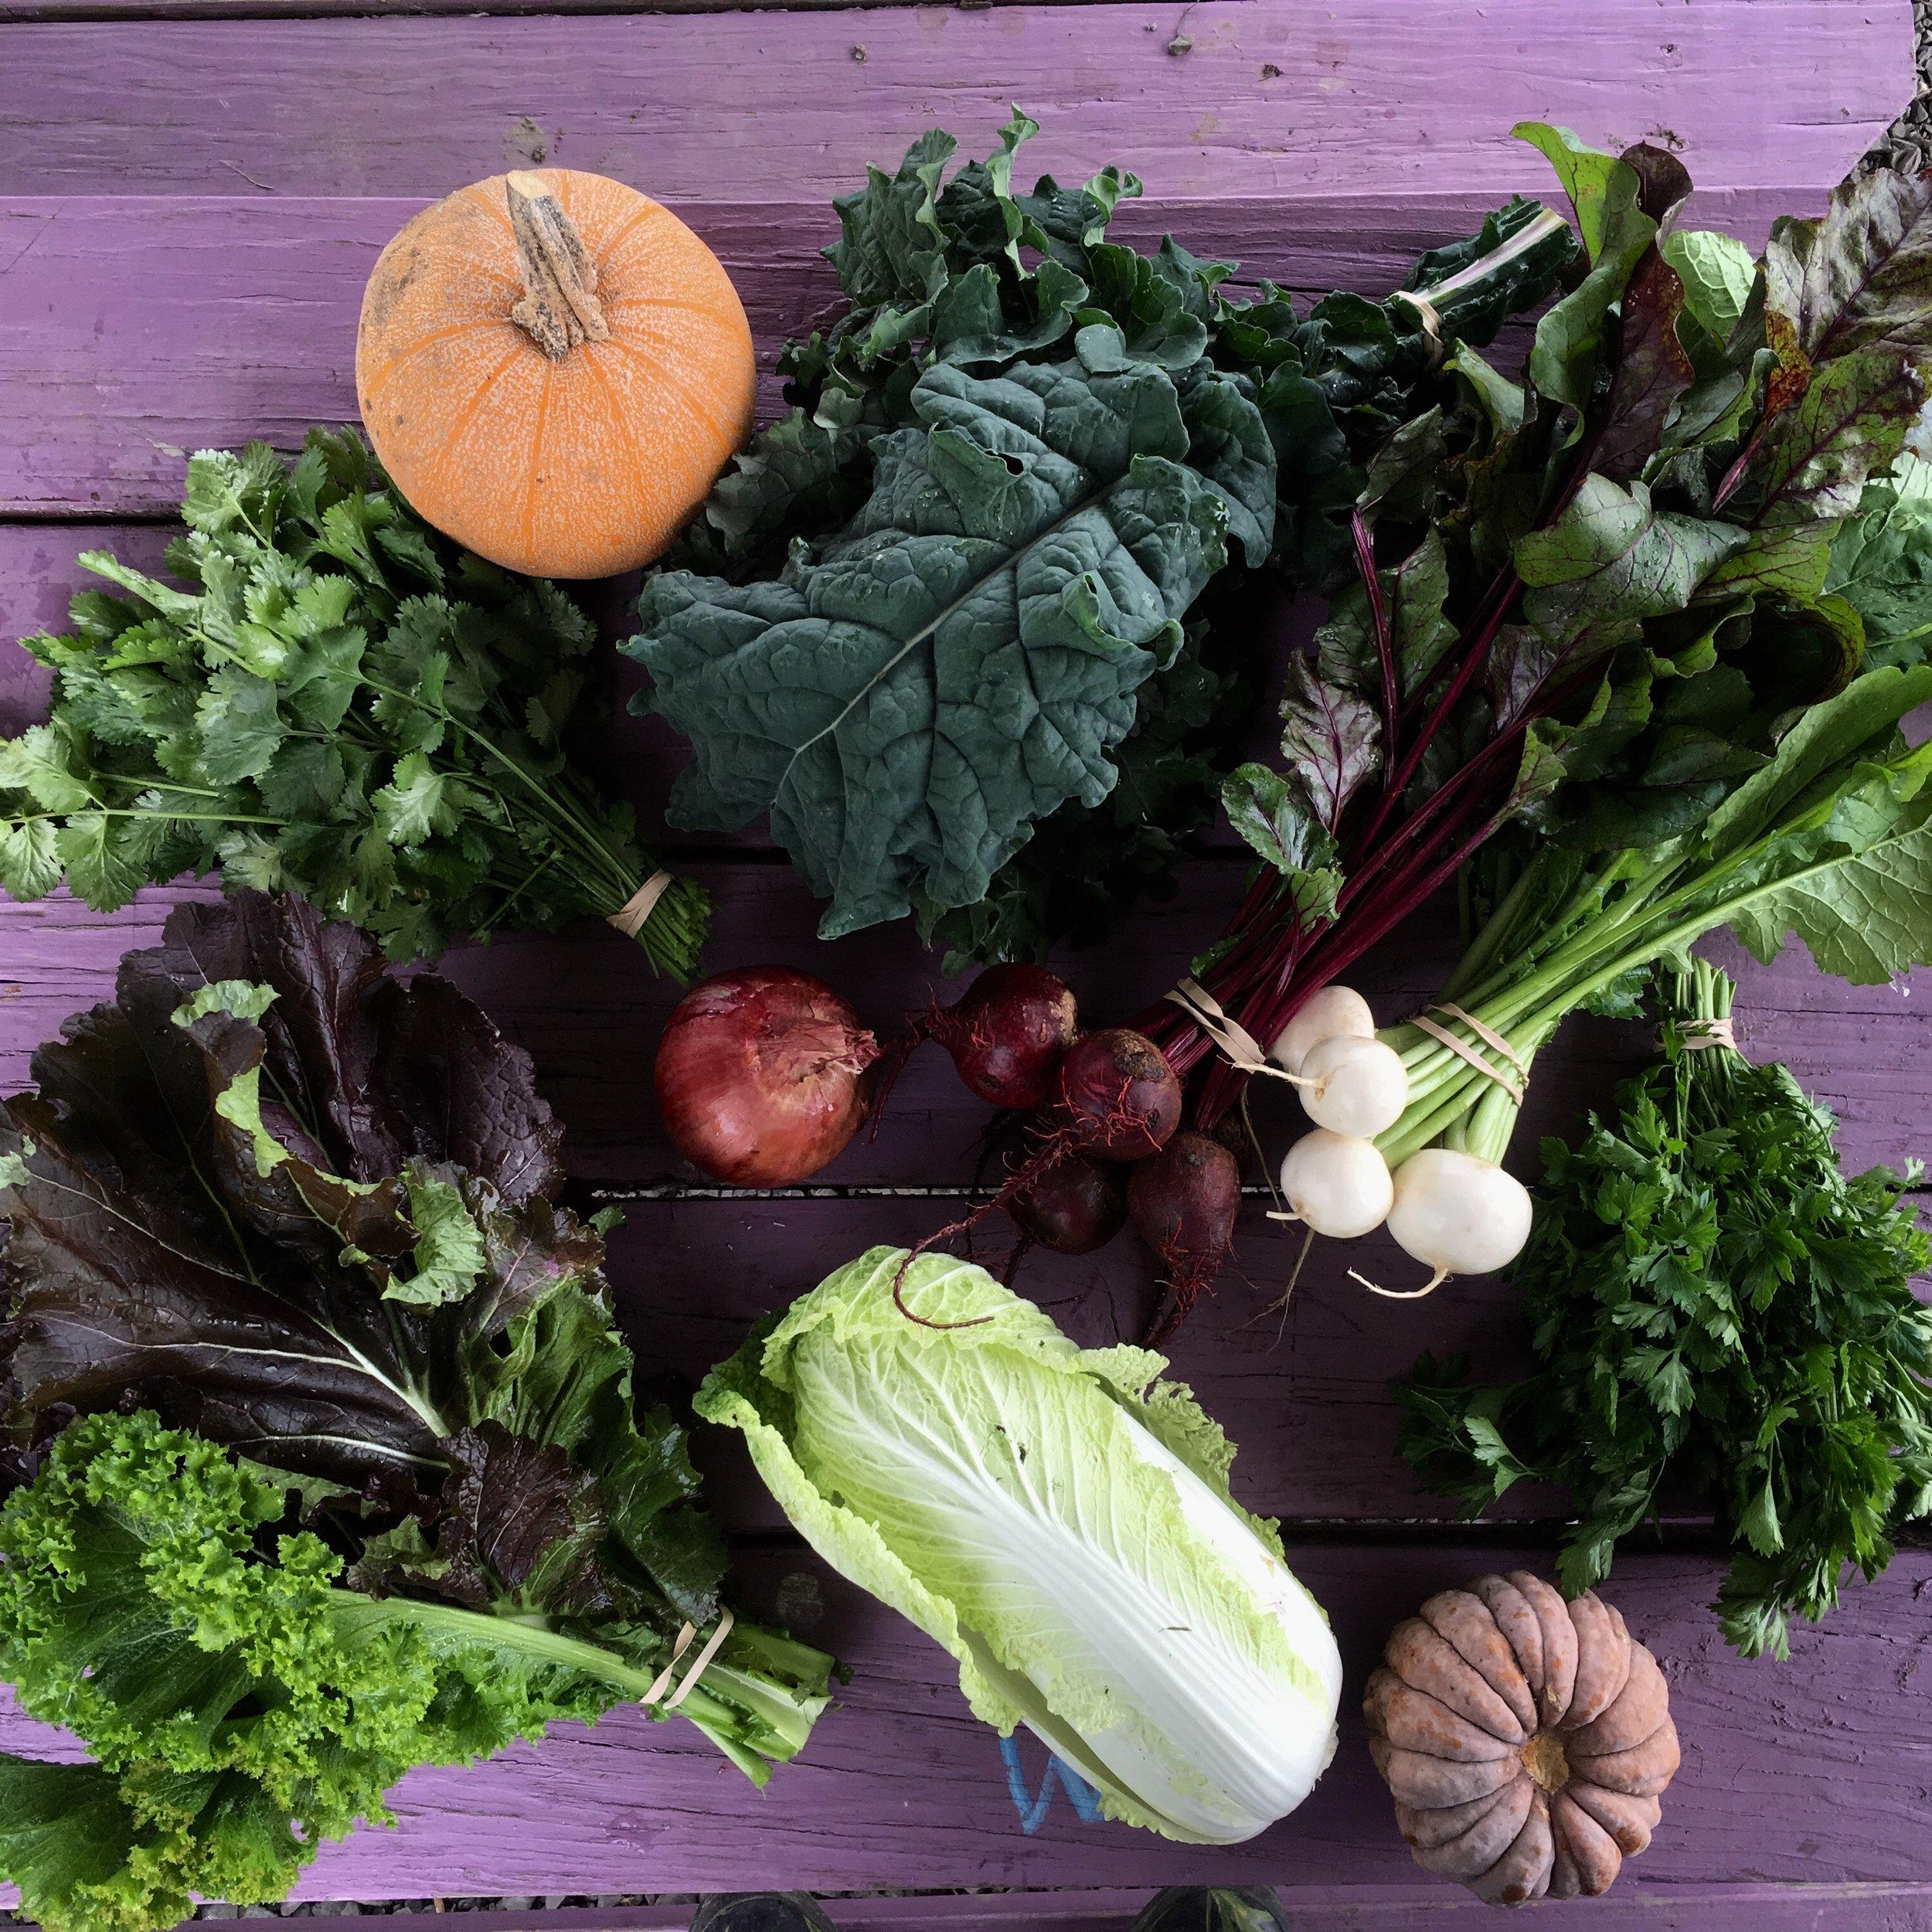 October - Bunching, braising, & salad greensBeets, Carrots, Radish, TurnipsCauliflower, Broccoli, CabbageCilantro, dill, & parsleyOnions- leeks, red storage onionsPeppers- hotPotatoesWinter squash- delicata, butternut, red kuri, kabocha, acorn, and morePumpkins- Pie pumpkins & carving pumpkins